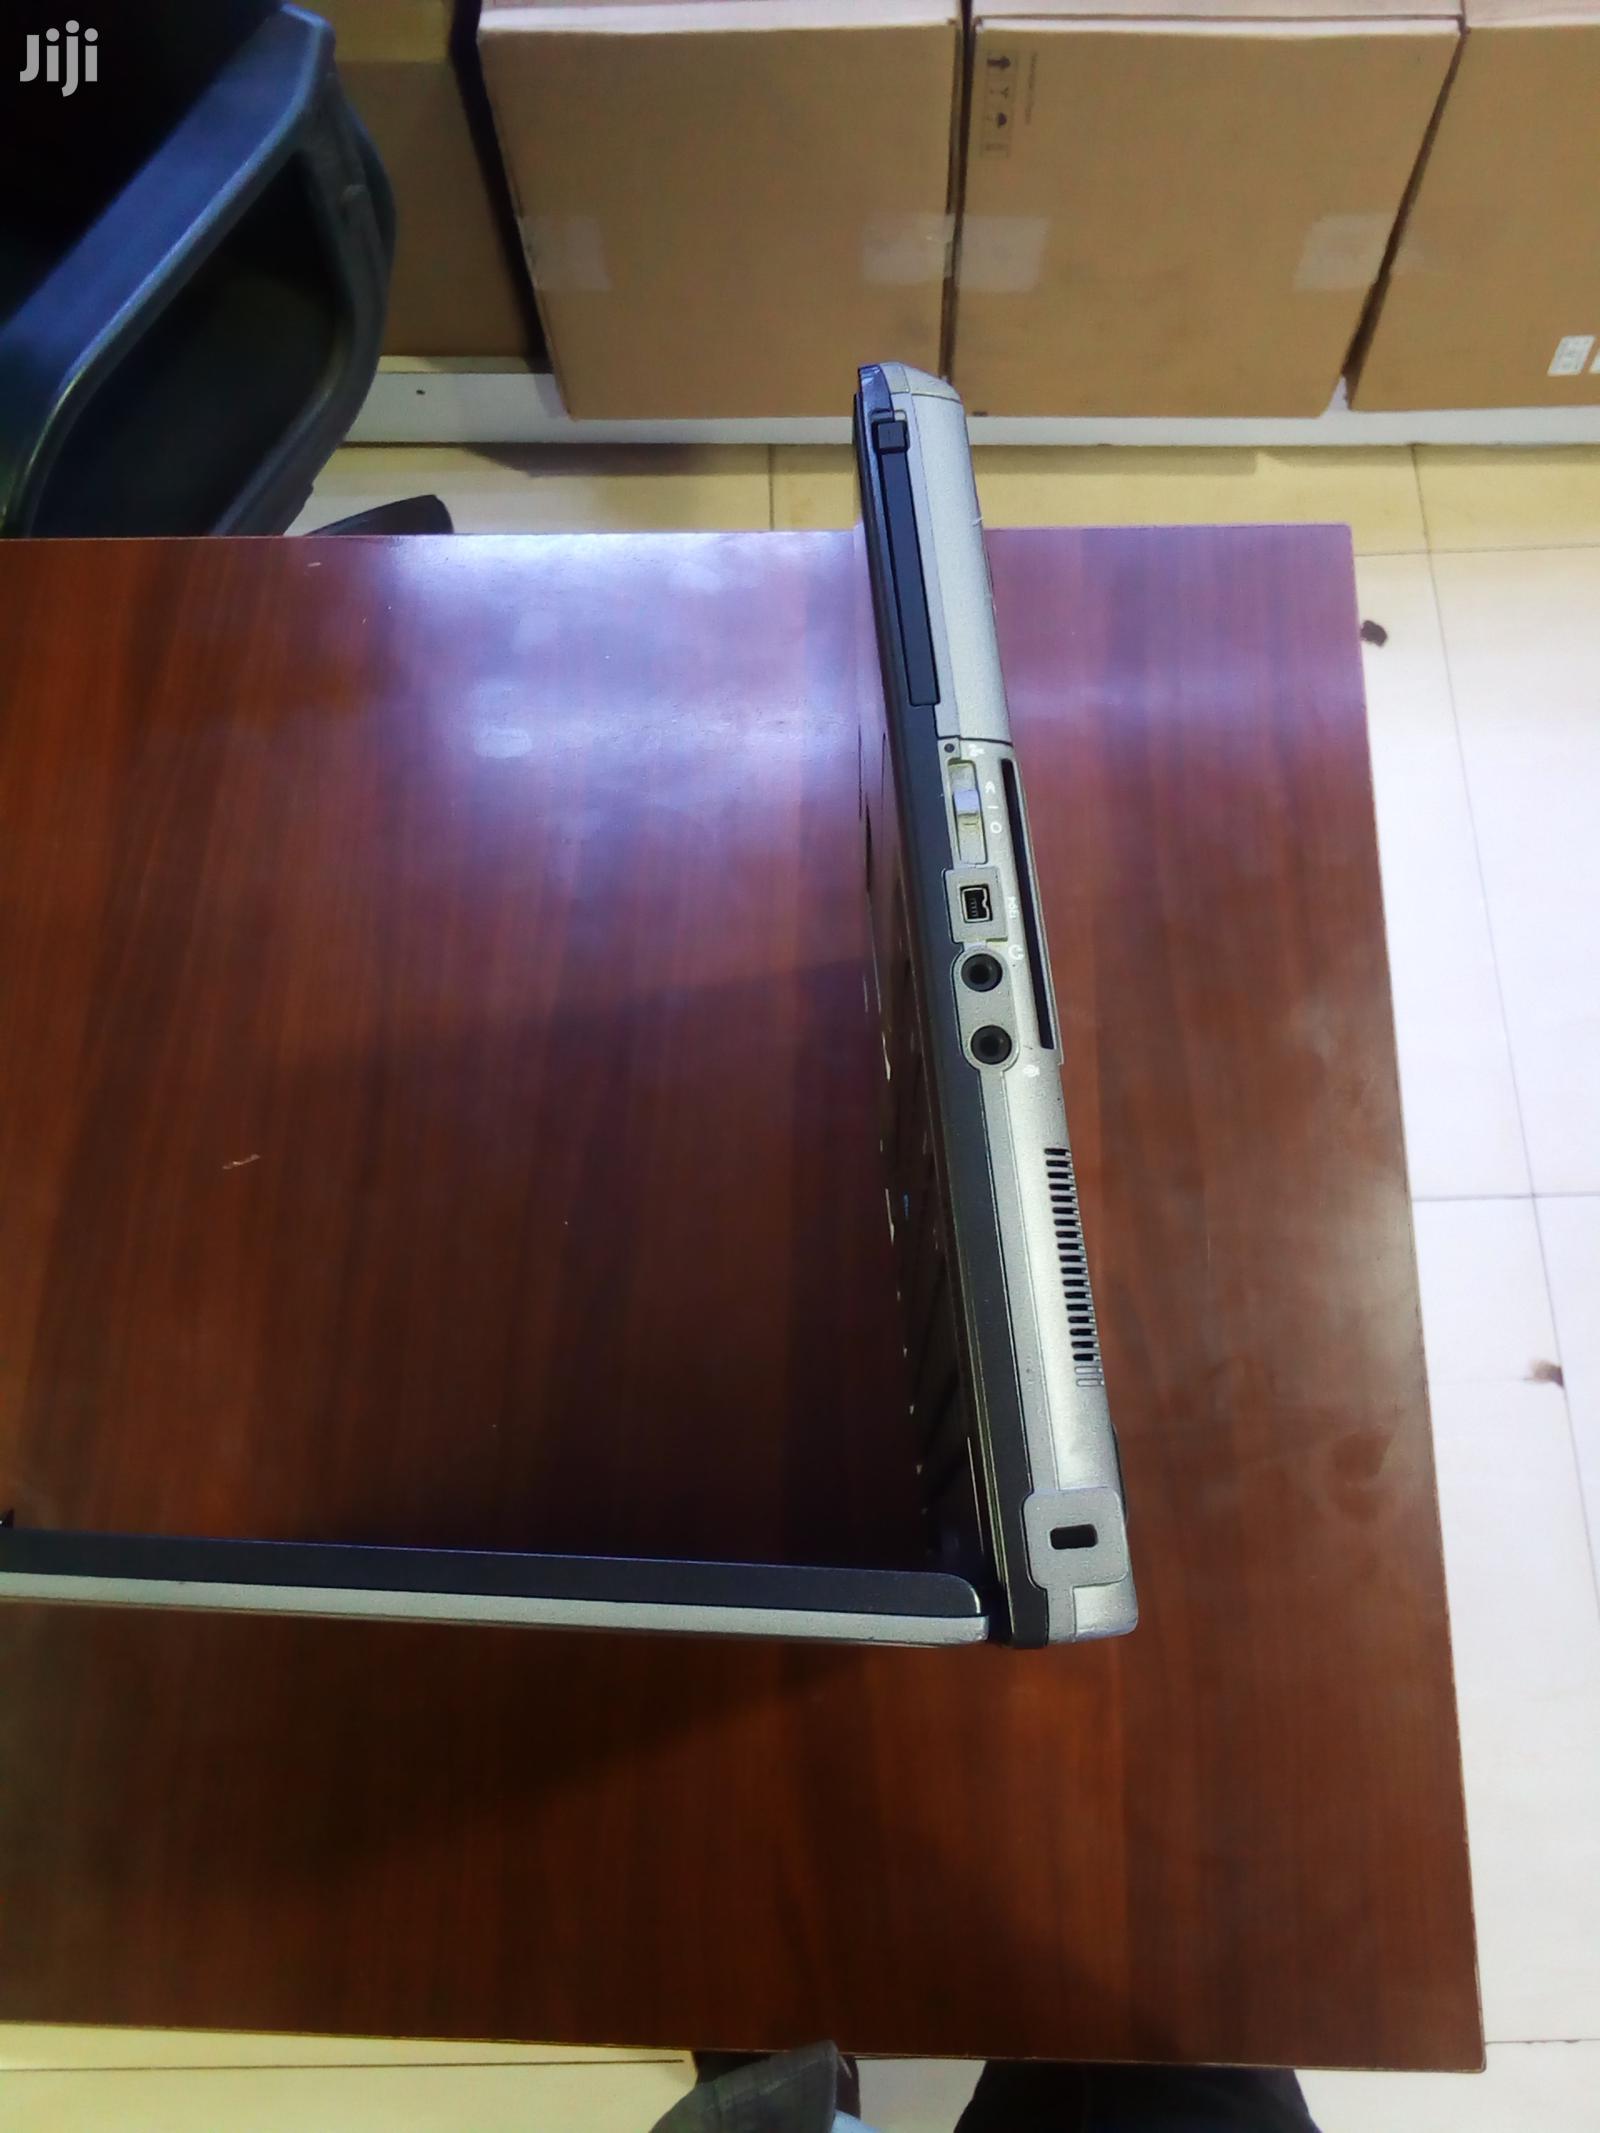 Laptop Dell Latitude 12 2GB Intel Core 2 Duo HDD 160GB | Laptops & Computers for sale in Kampala, Central Region, Uganda